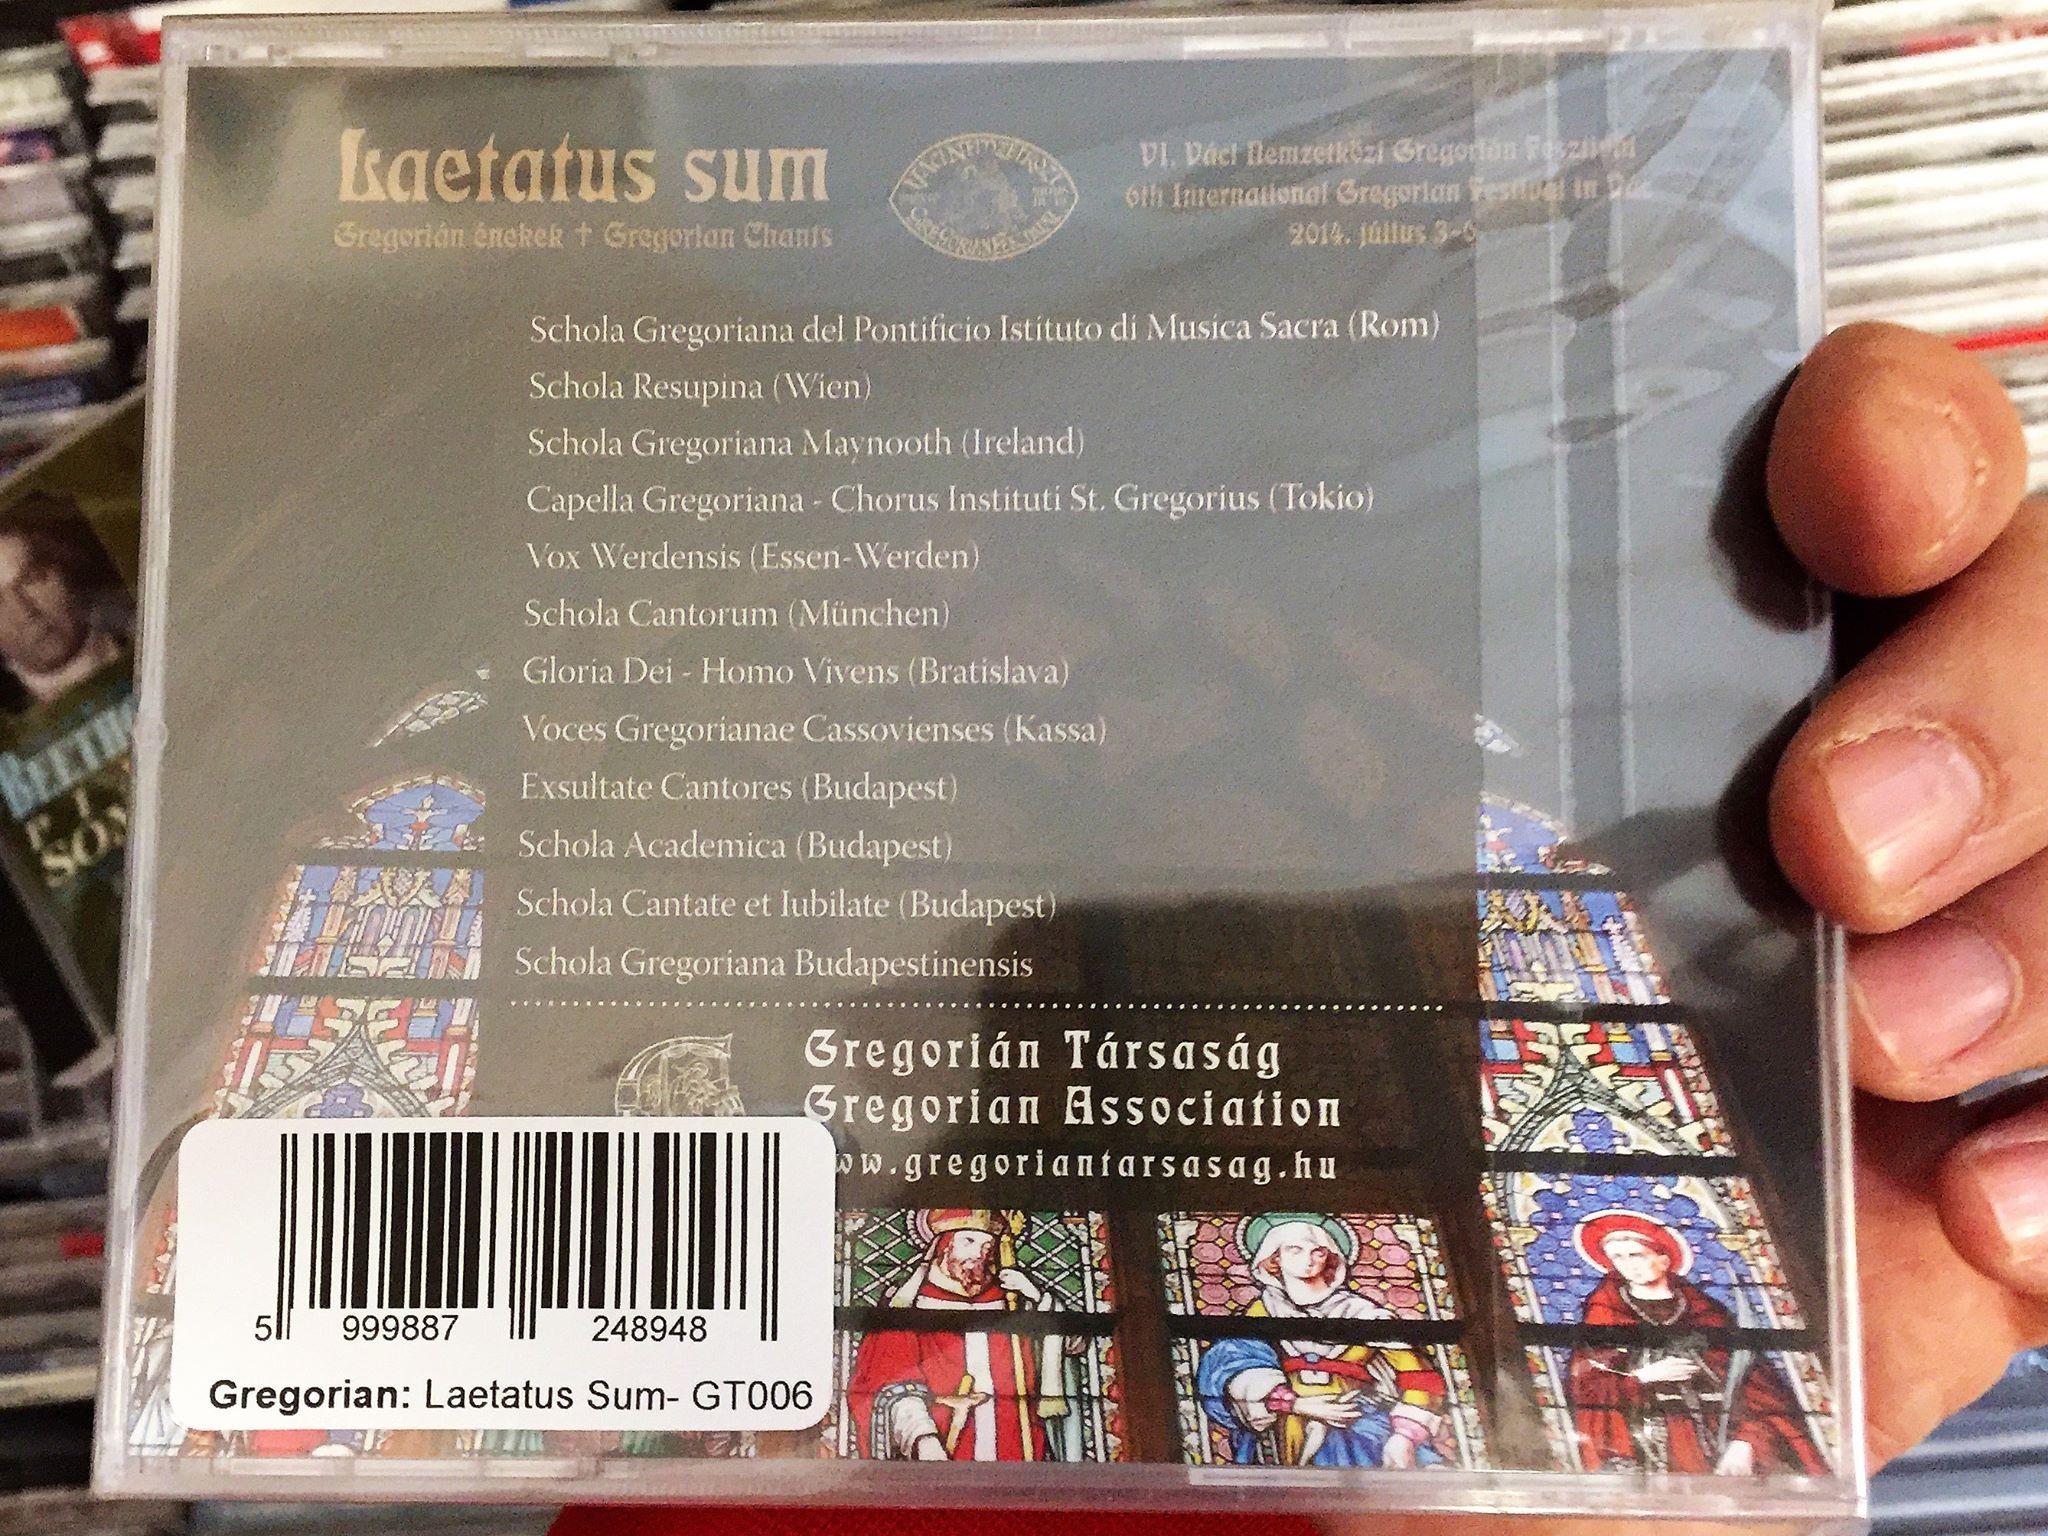 laetatus-sum-gregori-n-nekek-gregorian-chants-6th-international-gregorian-festival-in-v-c-hungarian-cd-2015-2-.jpg